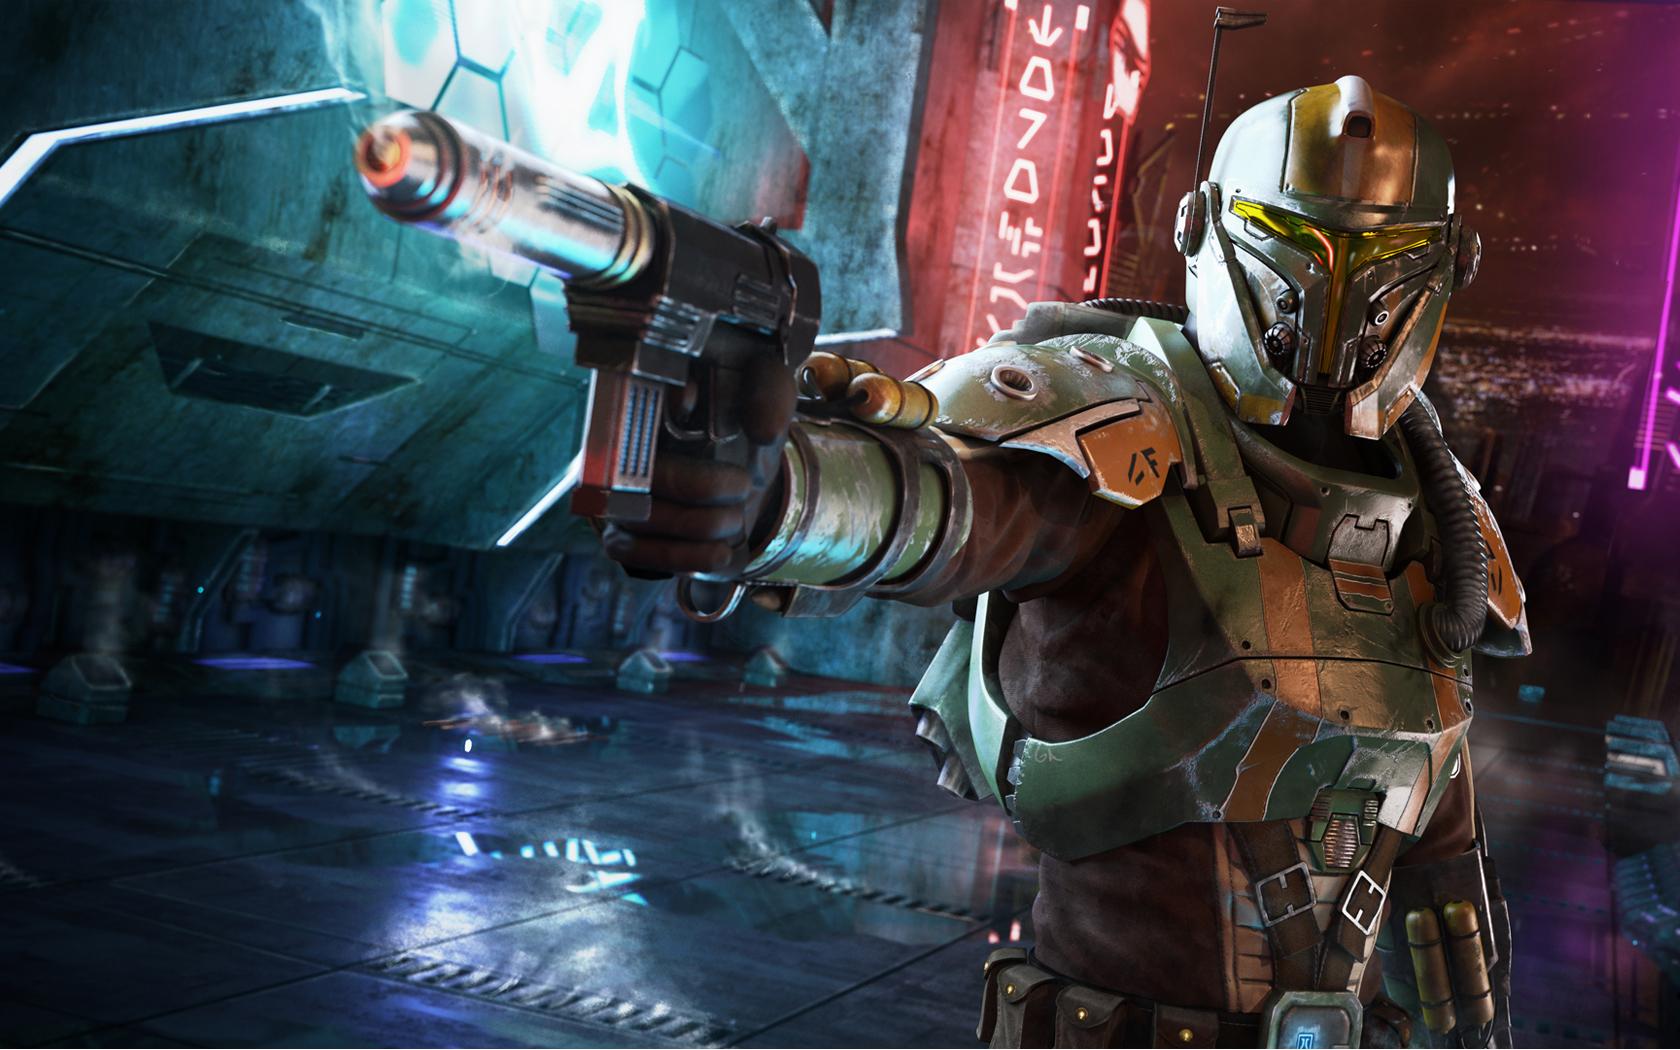 swtor wallpaper bounty hunter shows us a bounty hunter